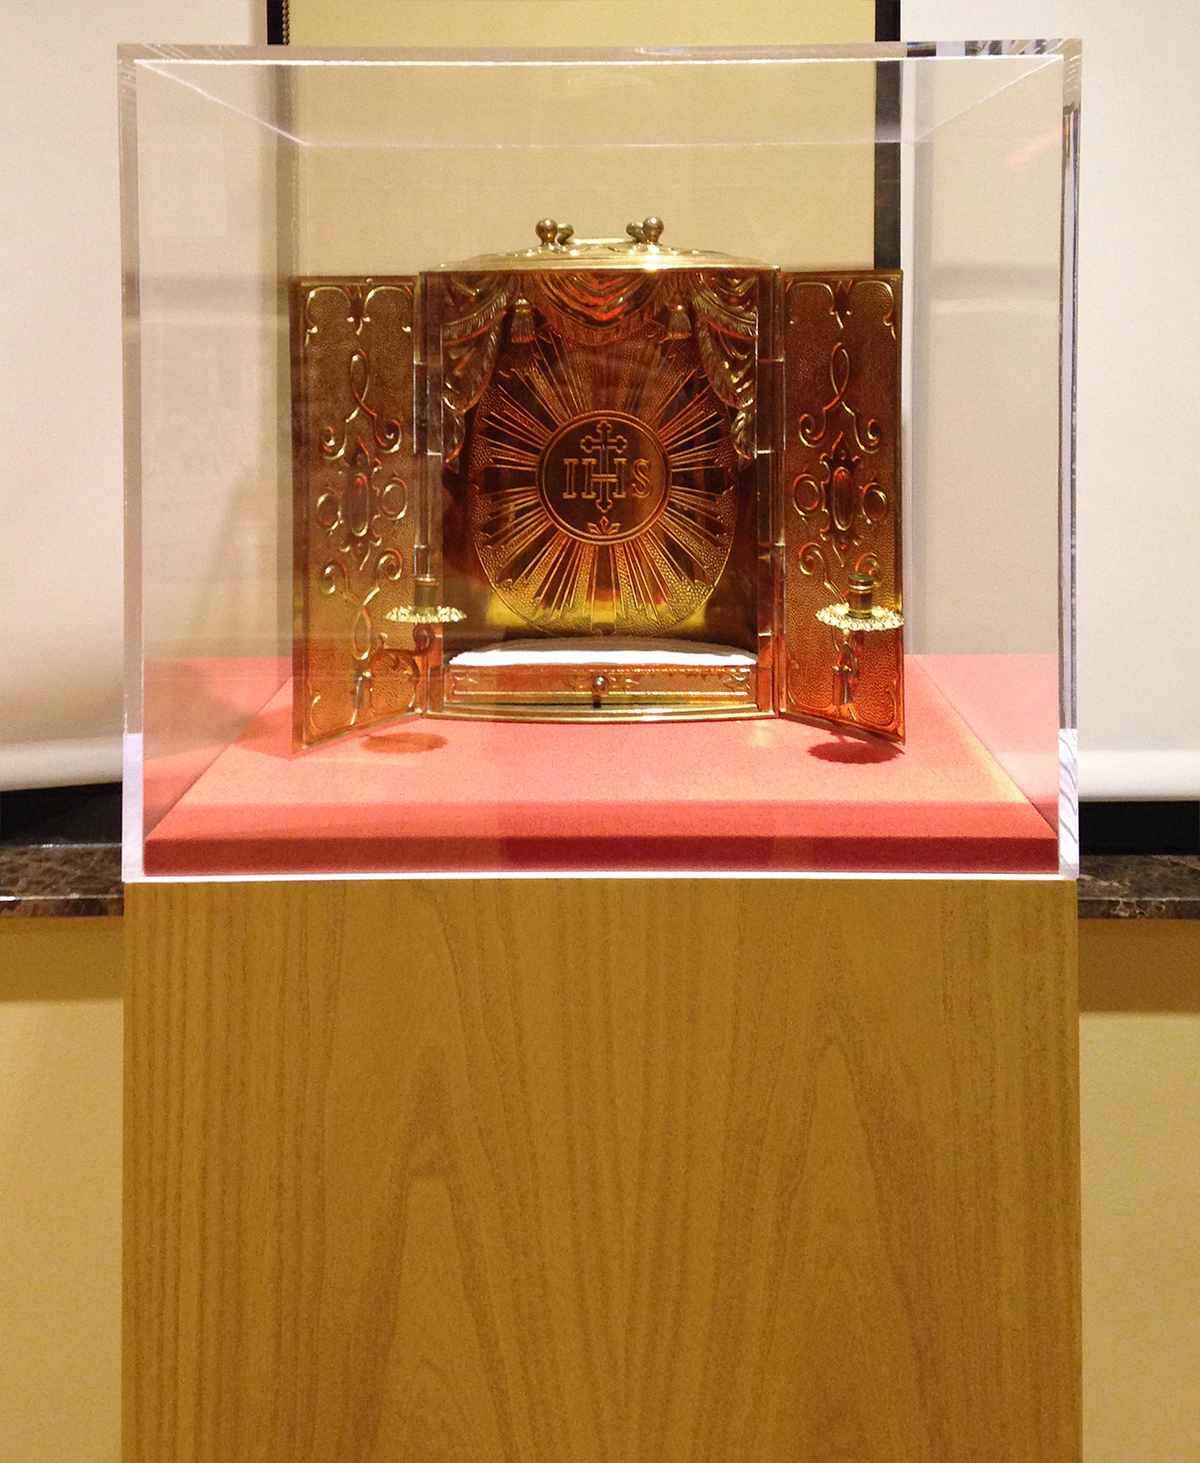 mother_cabrini_tabernacle.jpg